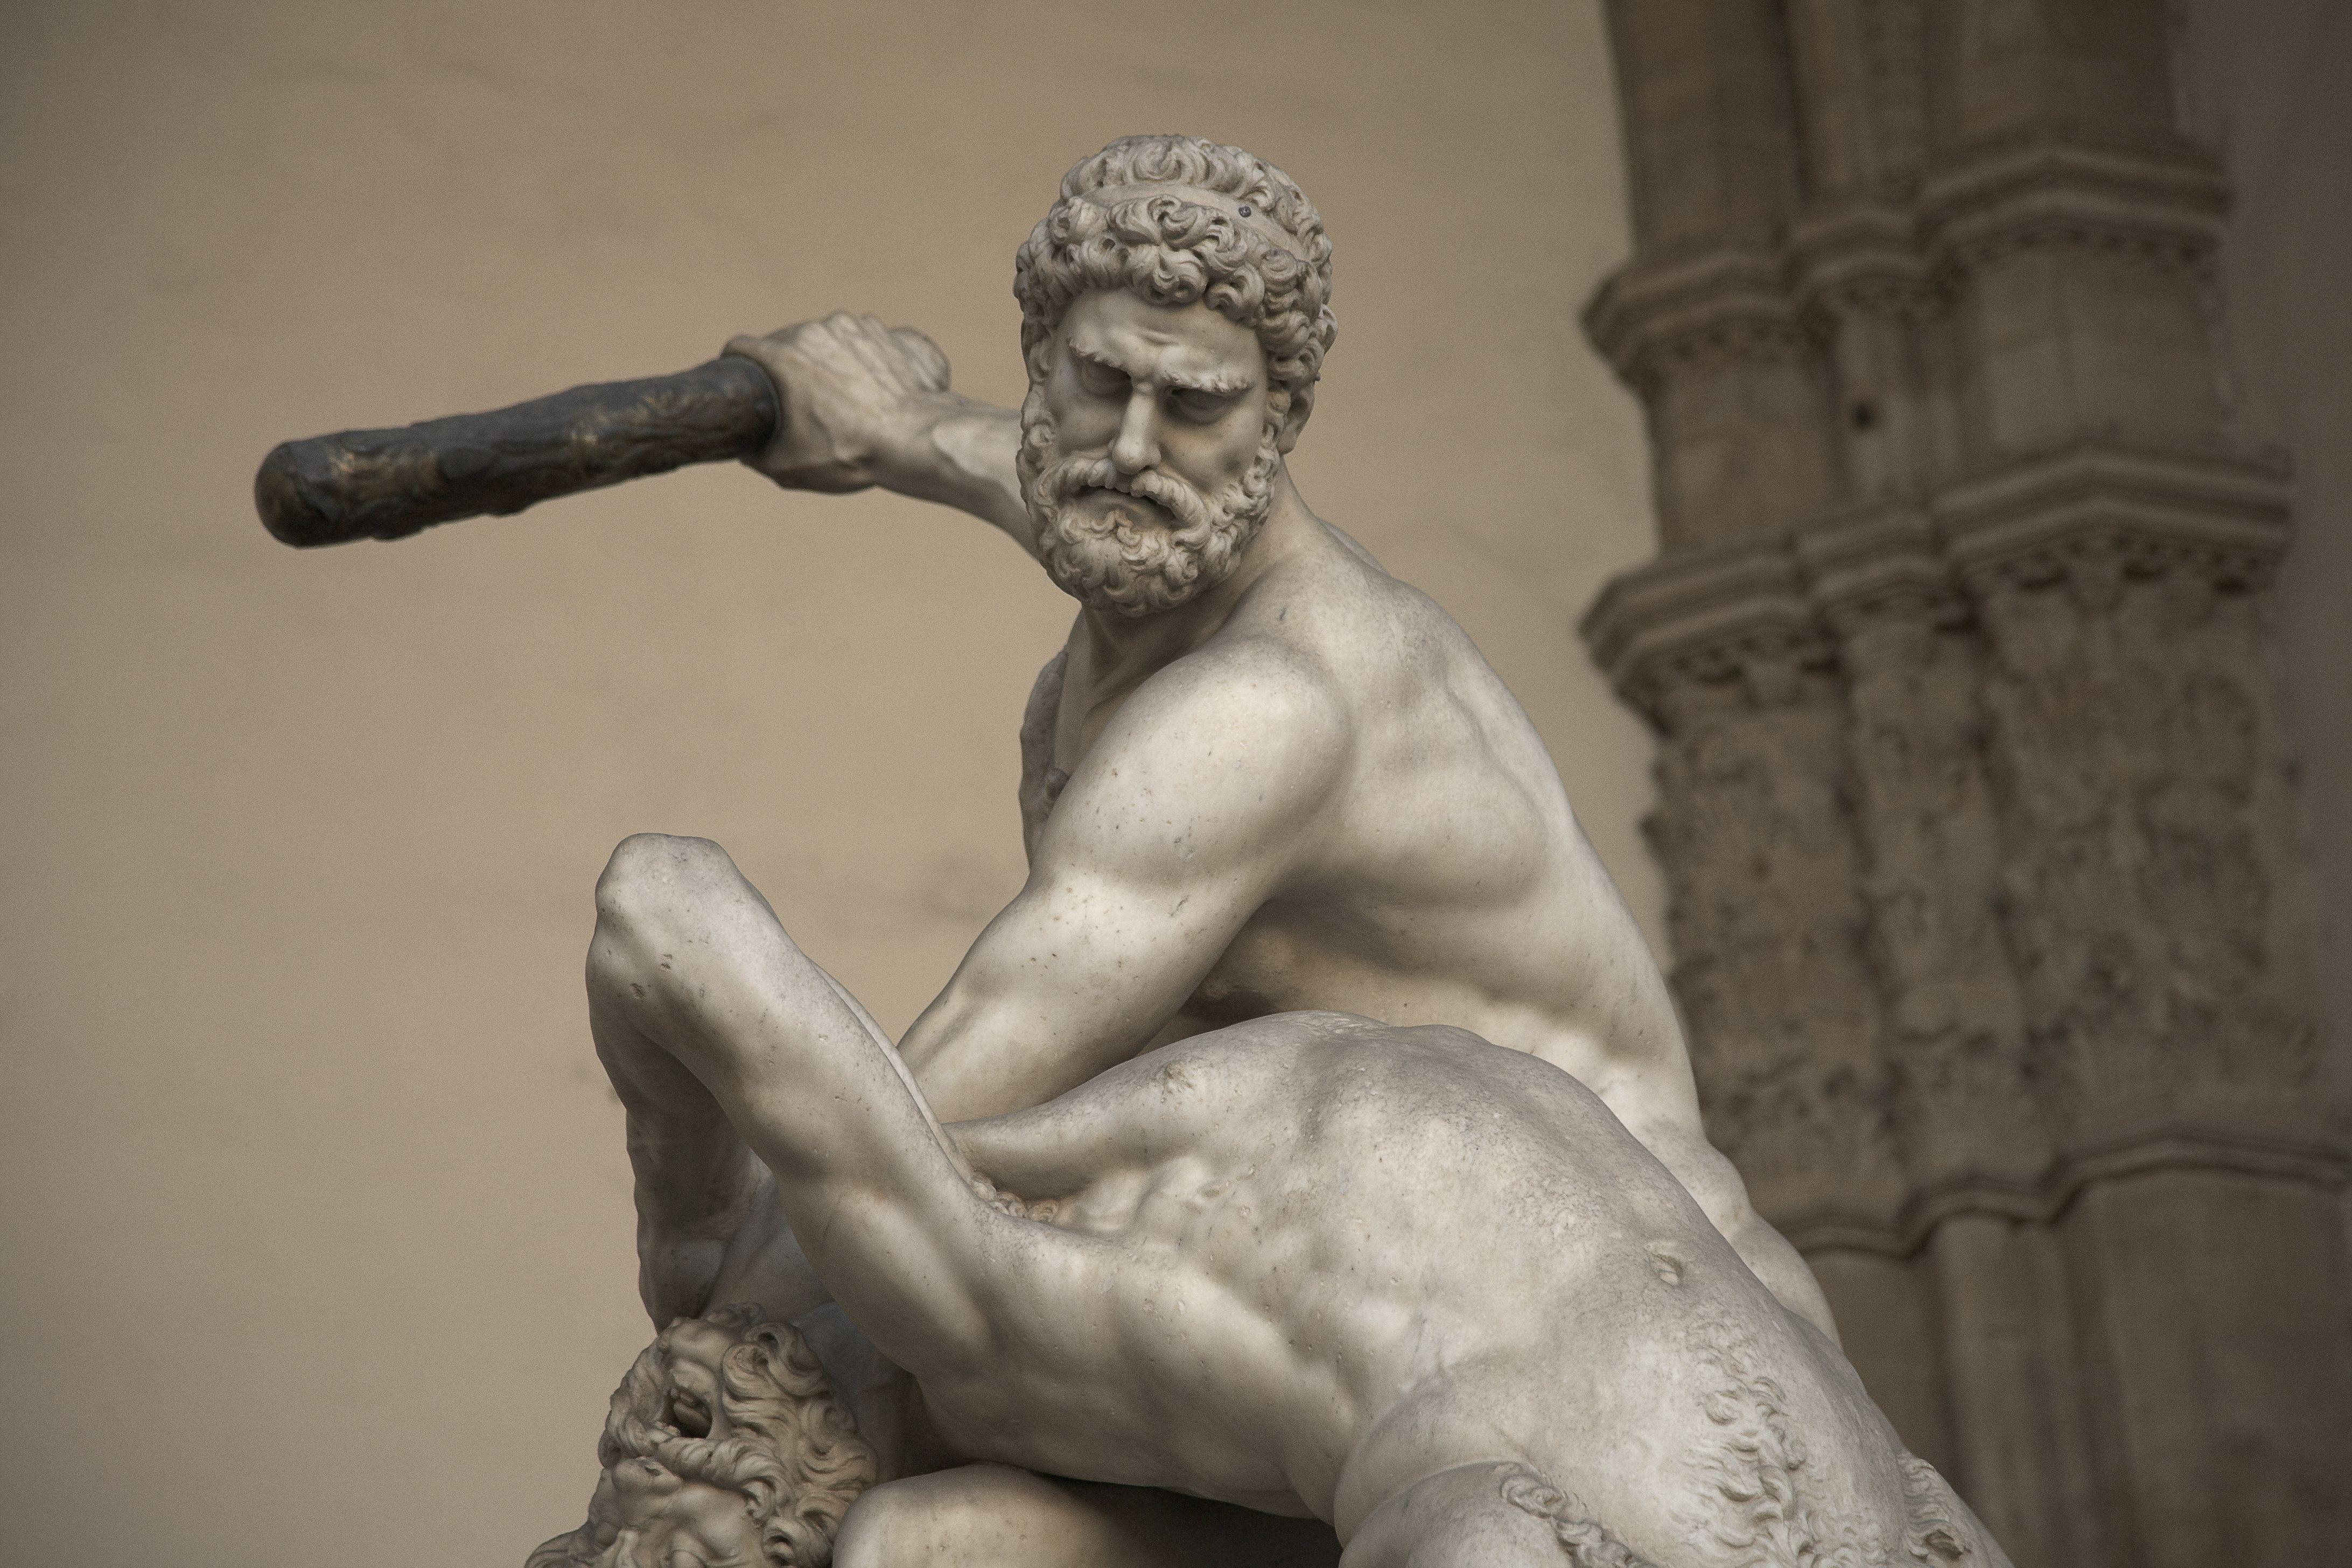 Hercules' Friends, Family, and Enemies